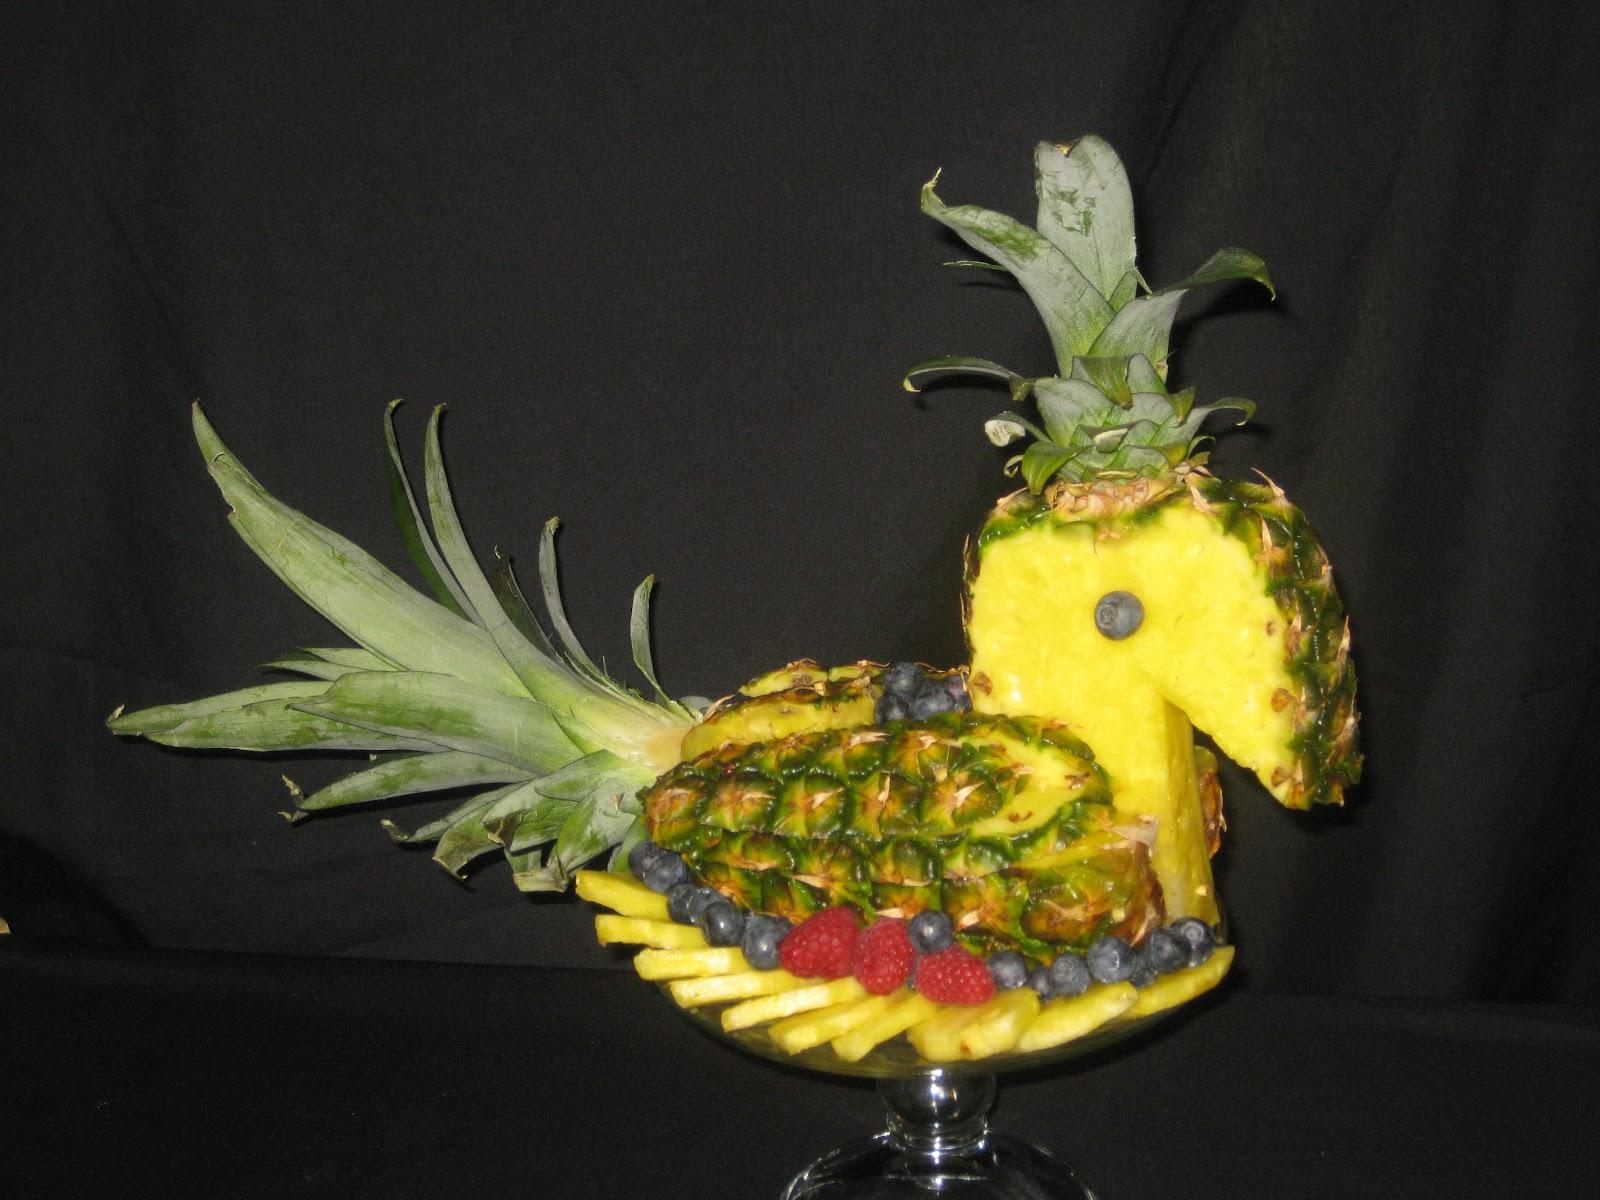 Fruit platter can say it june